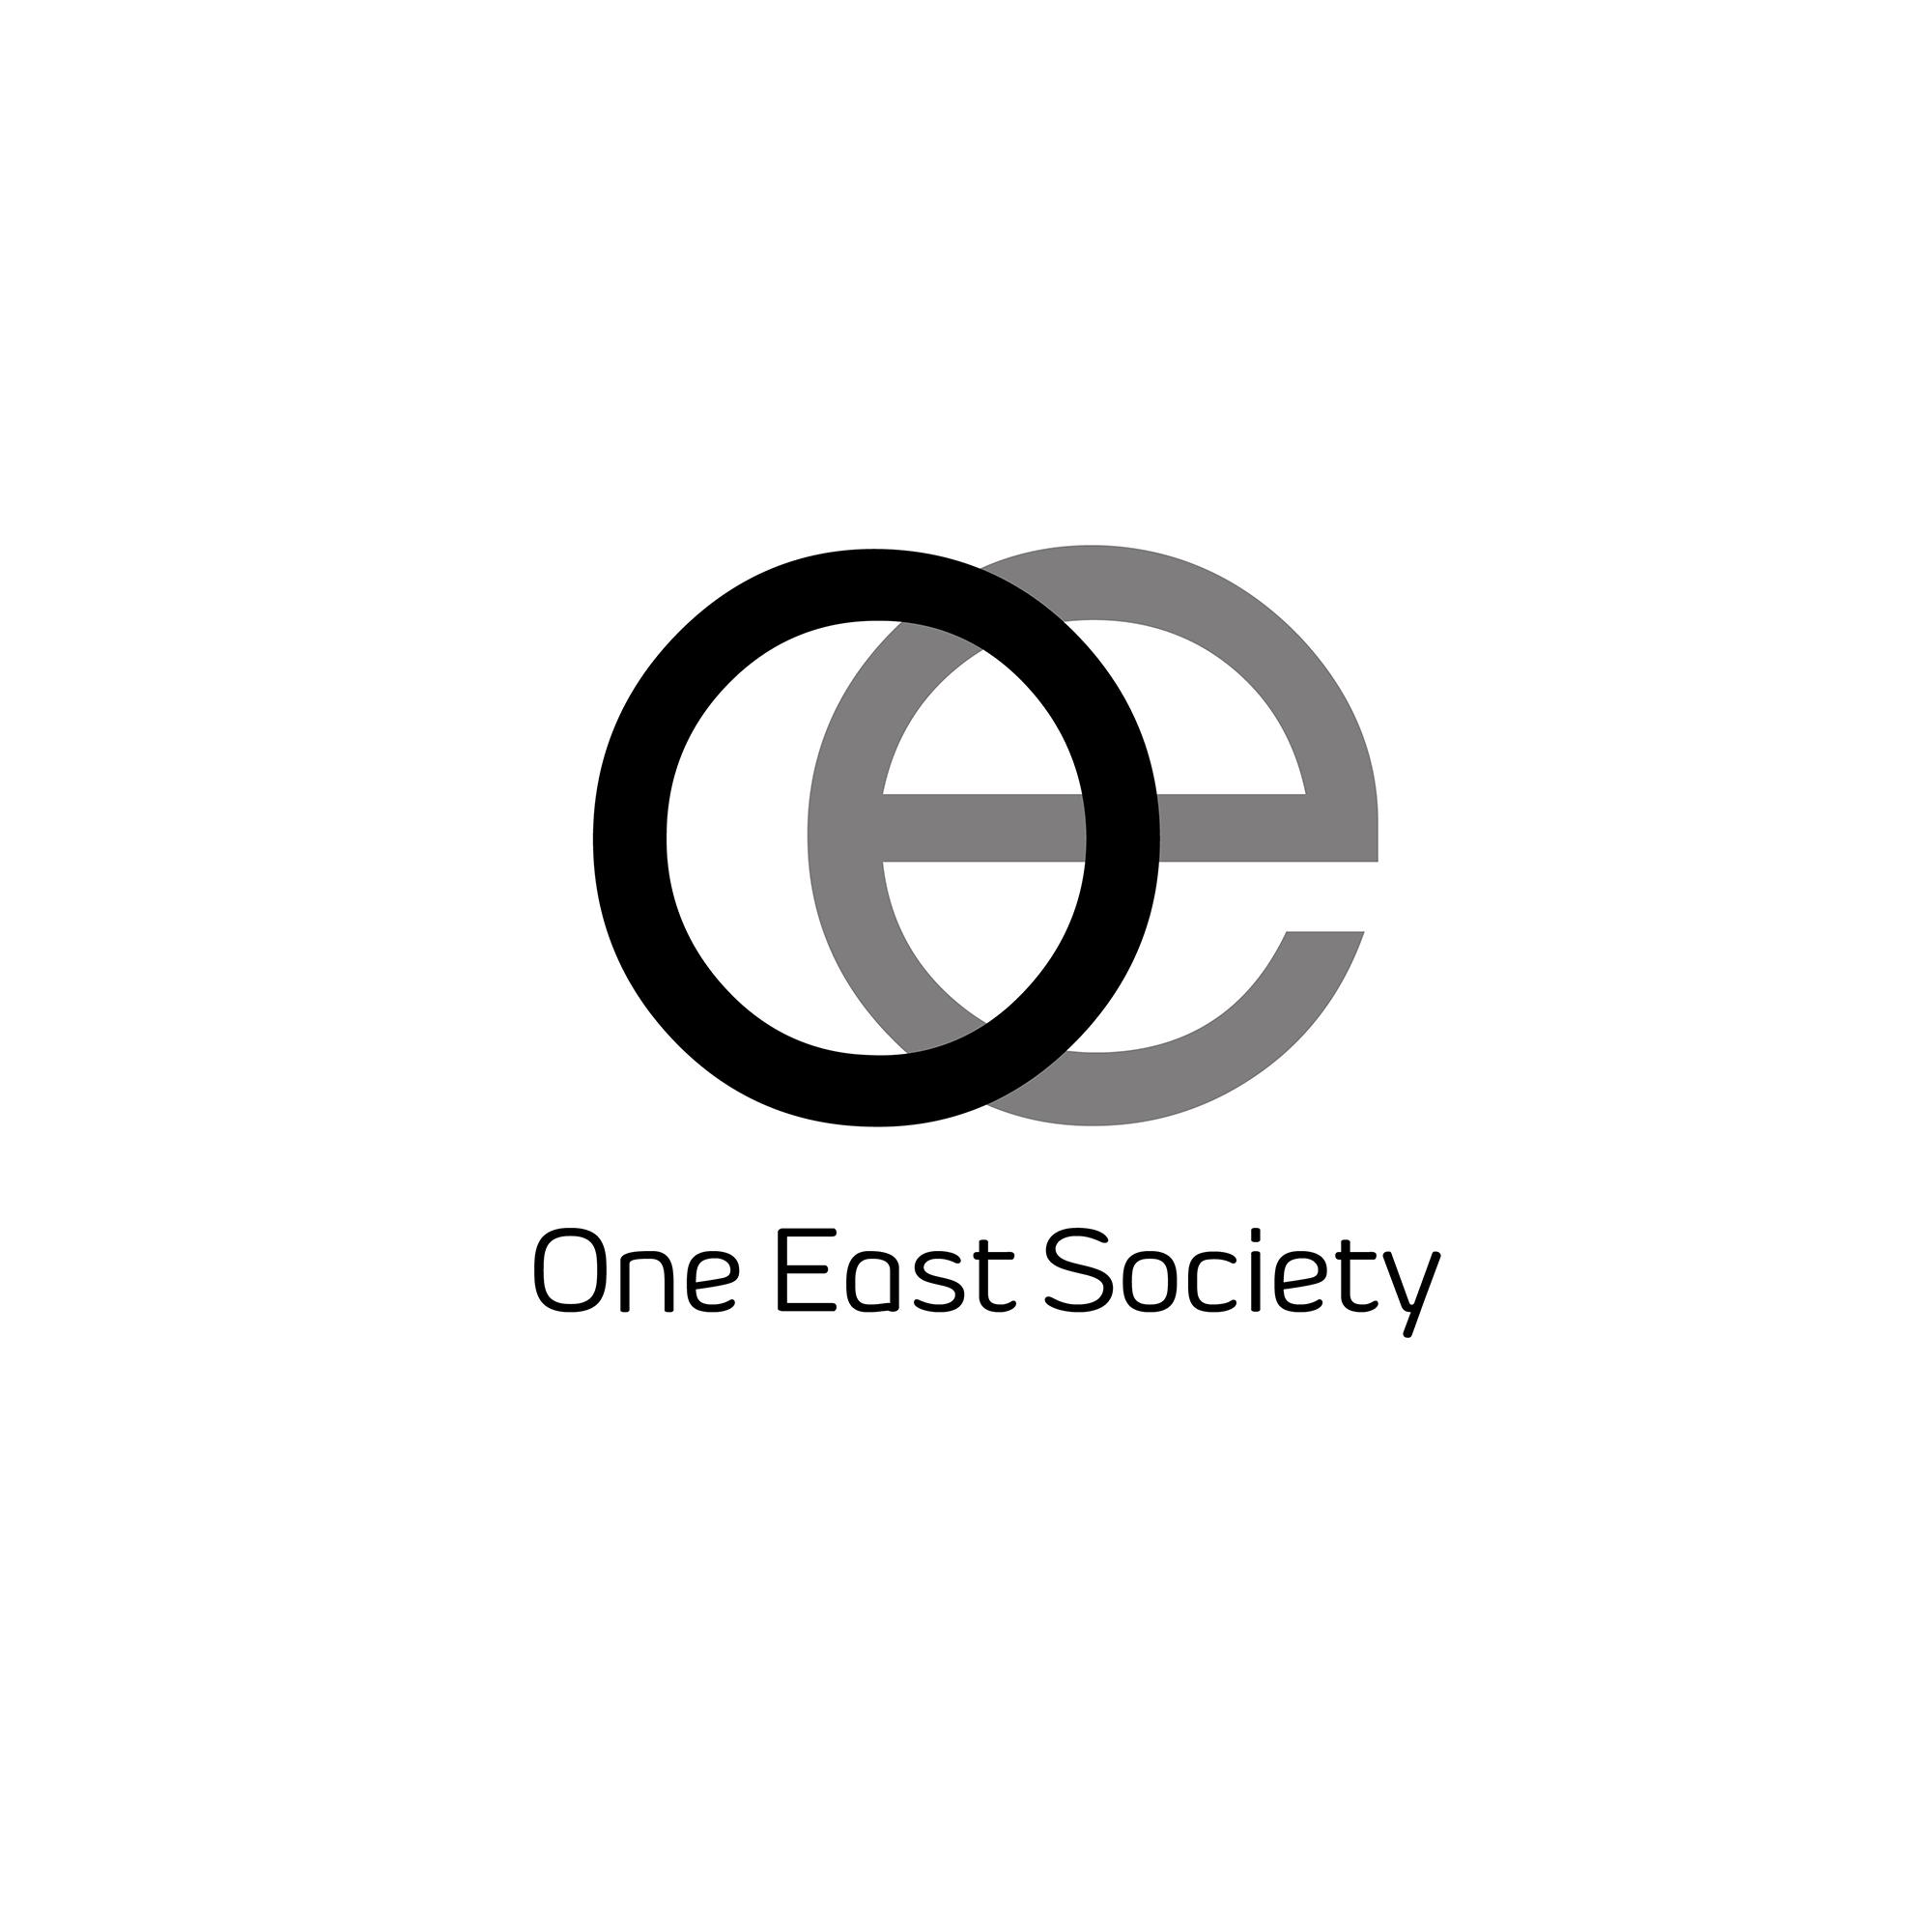 One East Society Logo